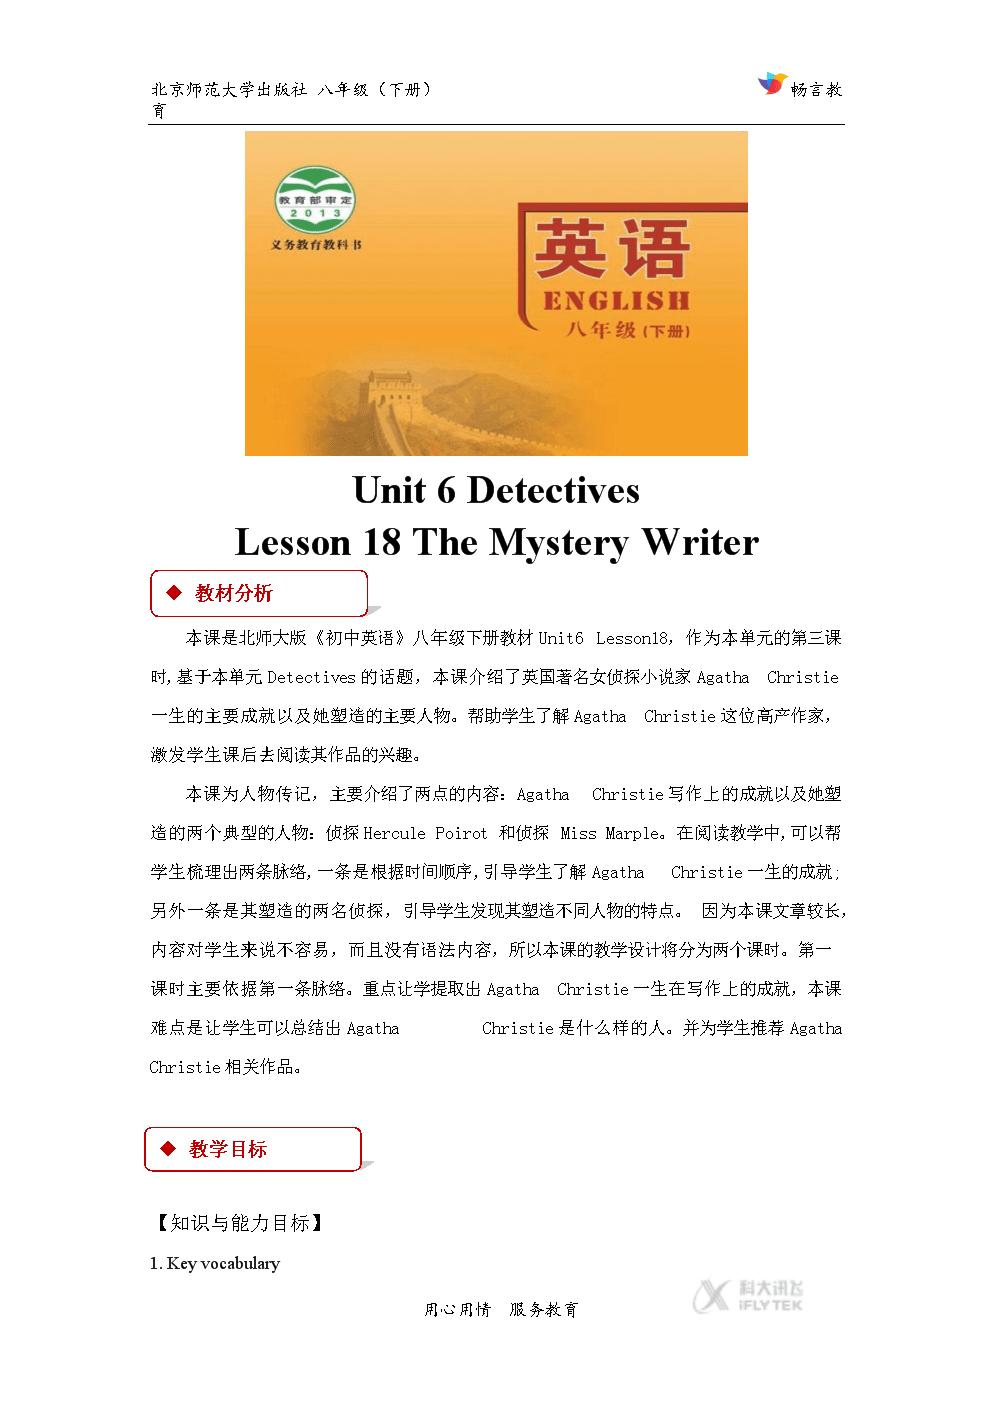 【教学设计】Unit 6 Lesson 18 (北师大).docx